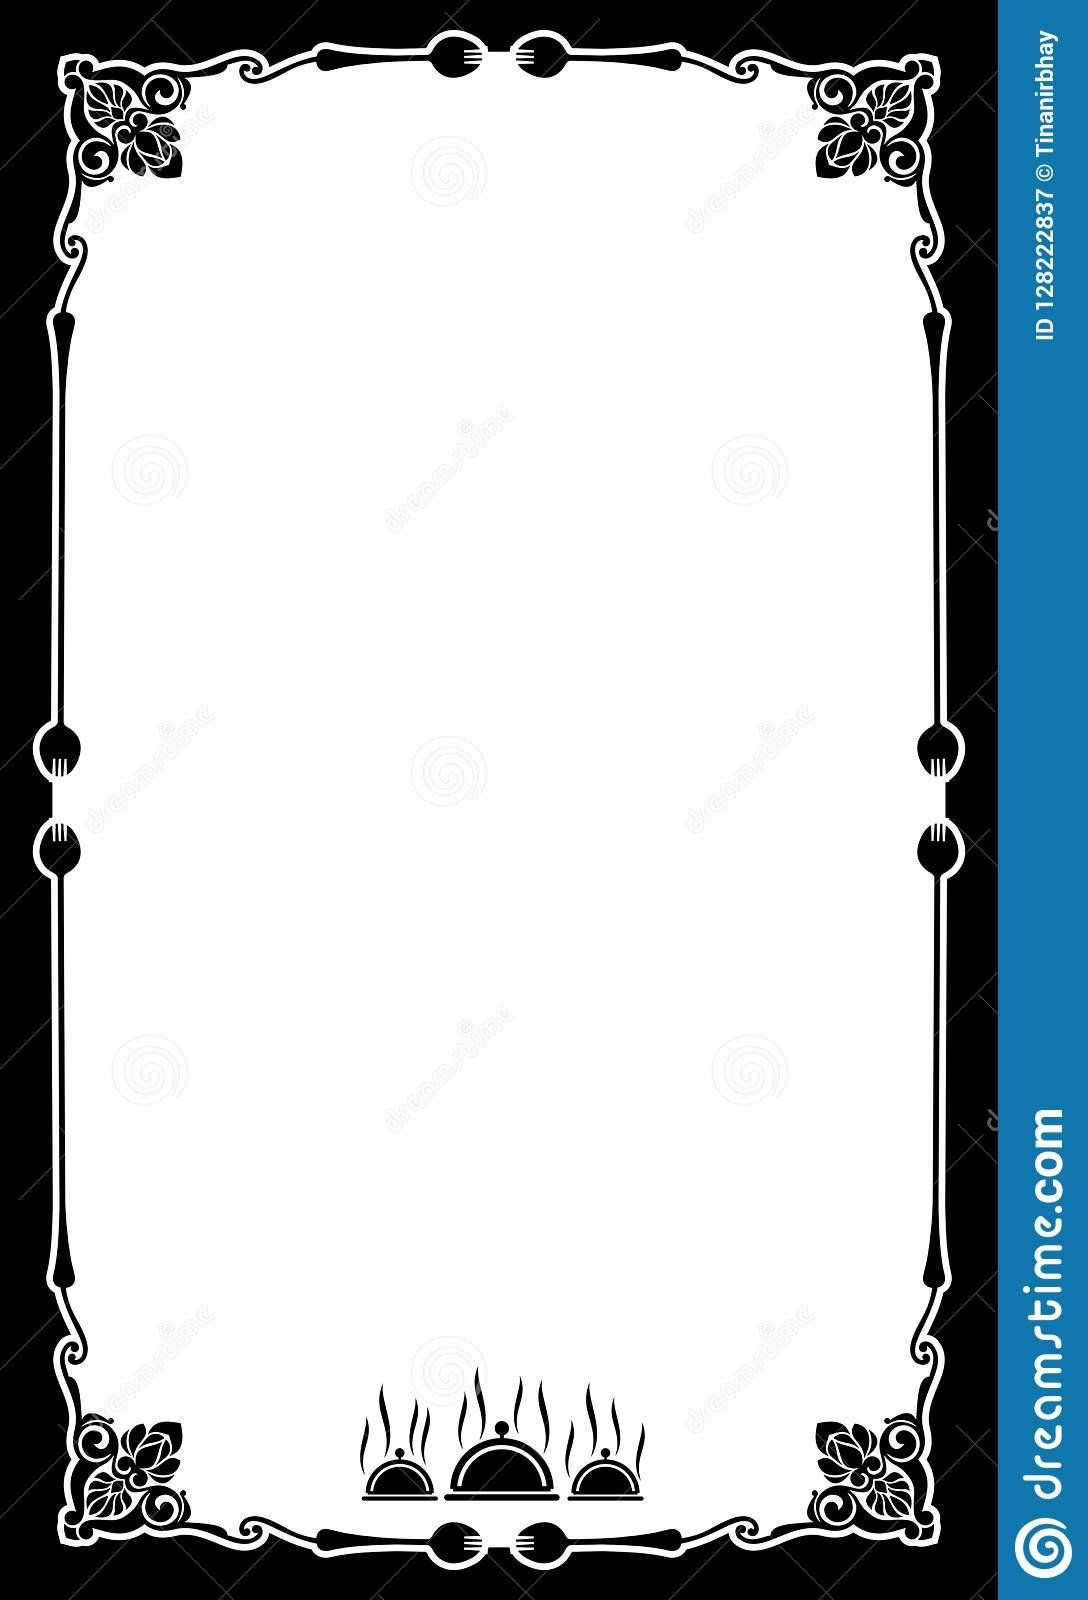 Round Menu Cards Templates Lovely Restaurant Menu Card Frame Template Stock Vector Menu Card Template Menu Template Restaurant Menu Card